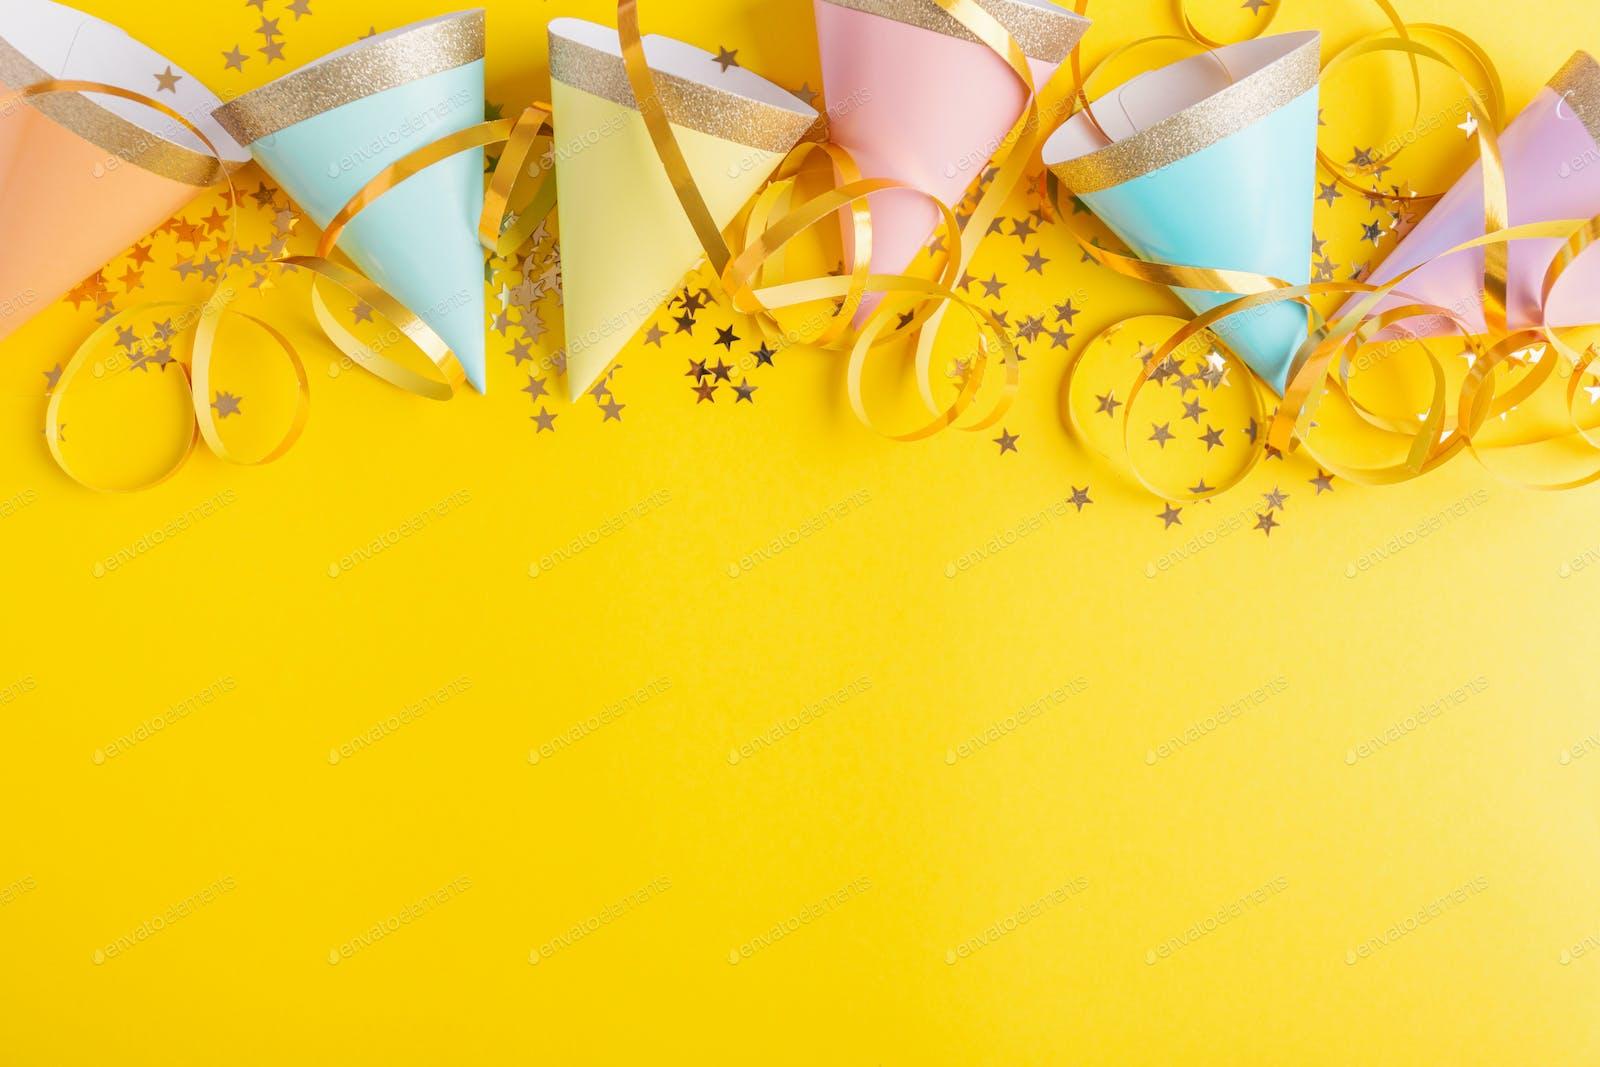 Birthday Party Background On Yellow Photo By Valeria Aksakova On Envato Elements